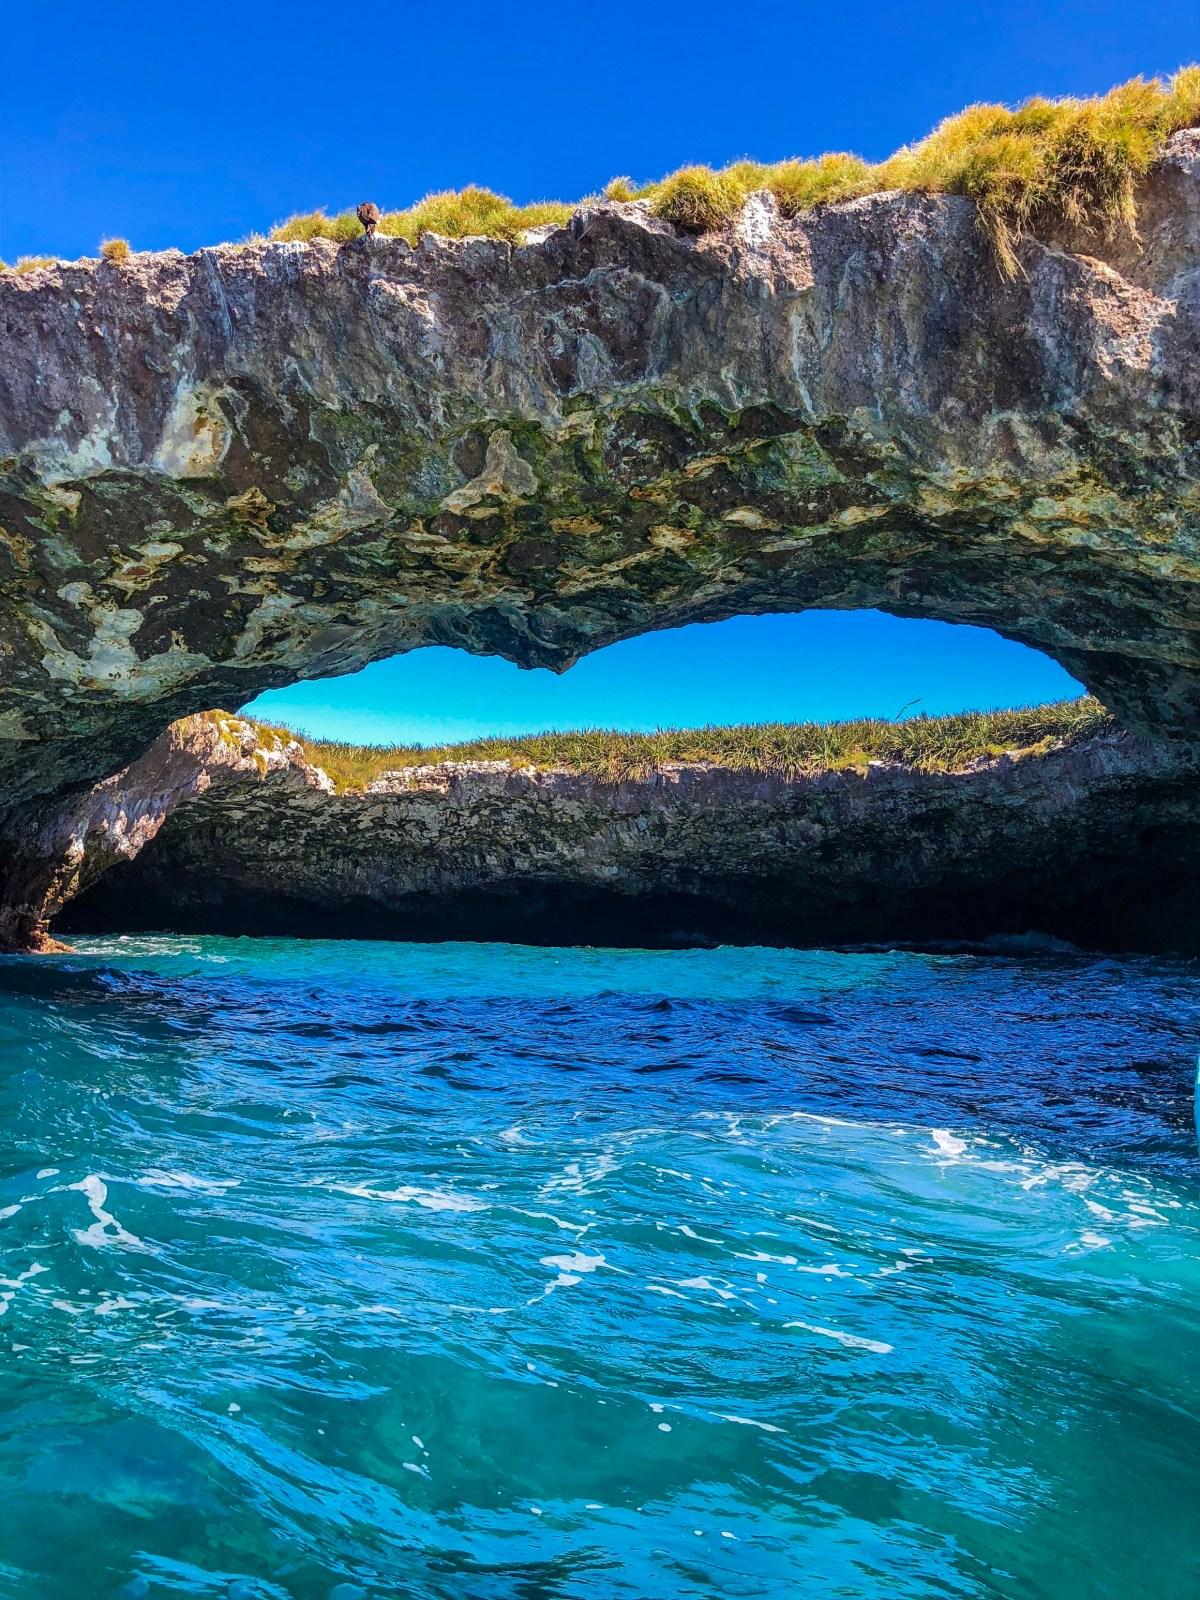 Islas-Marietas-Hole